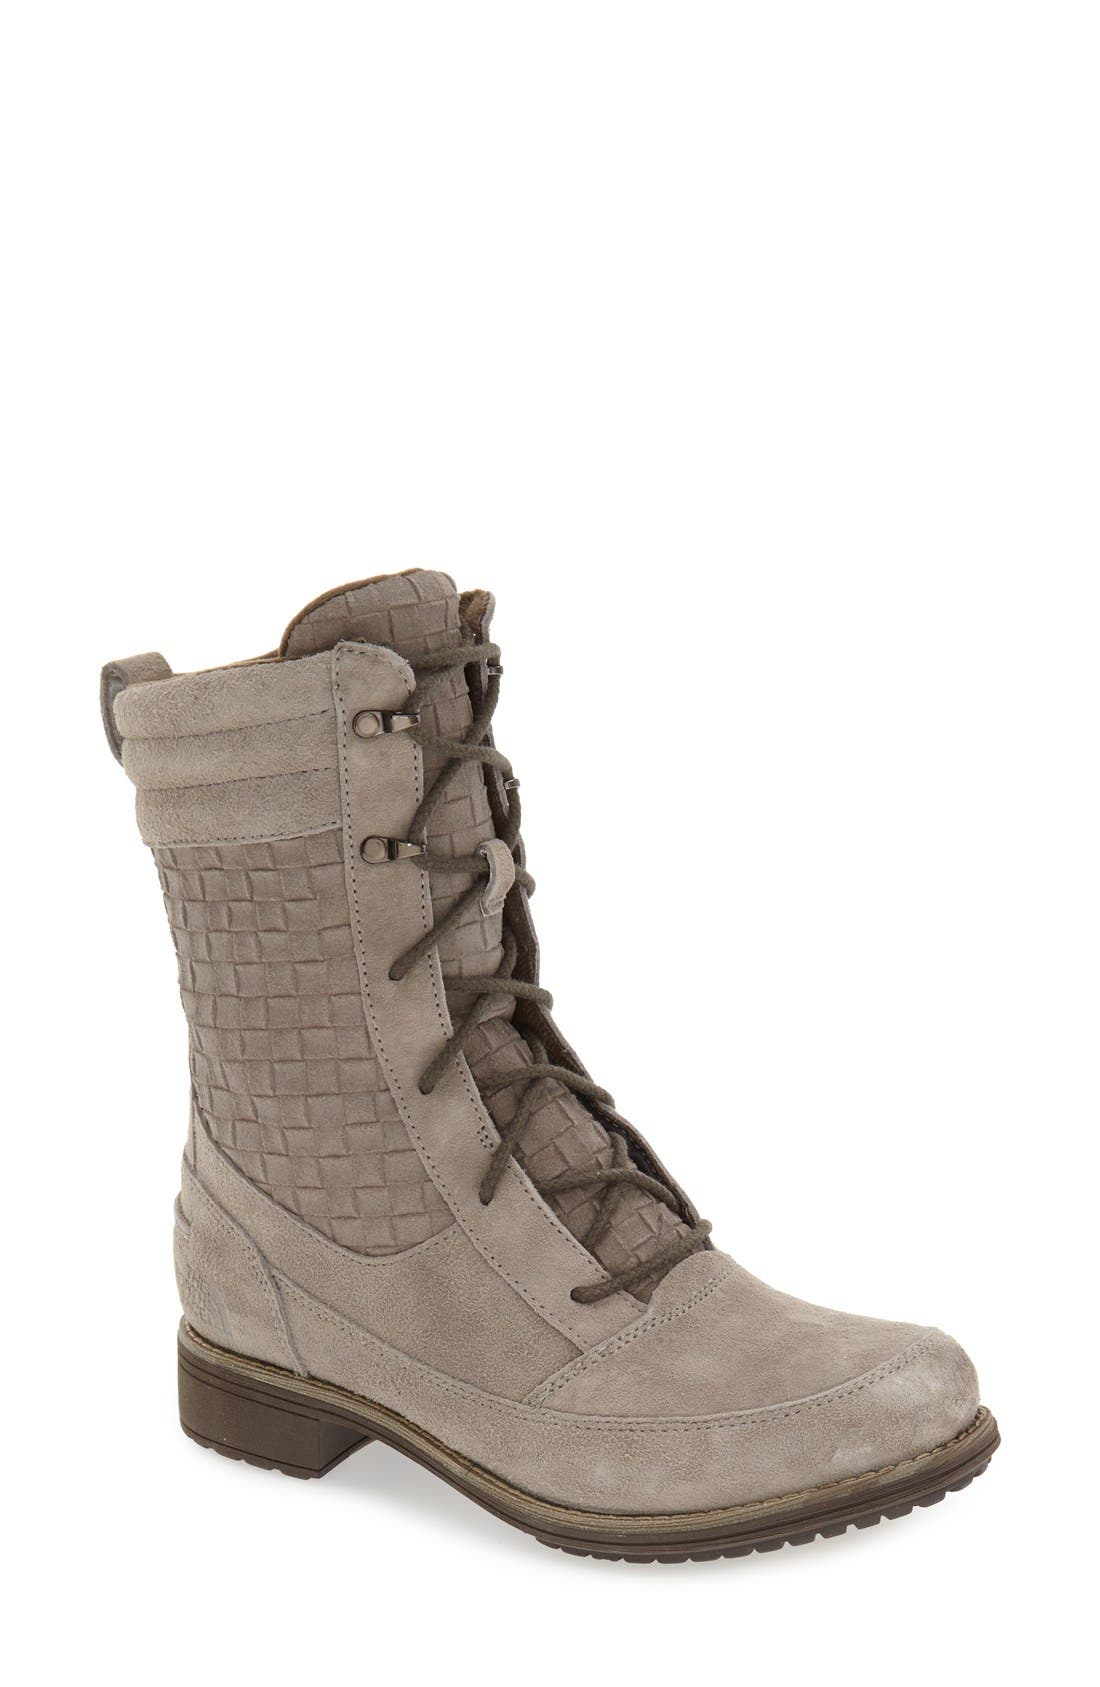 Main Image - The North Face 'Bridgeton Lace' Waterproof Boot (Women)